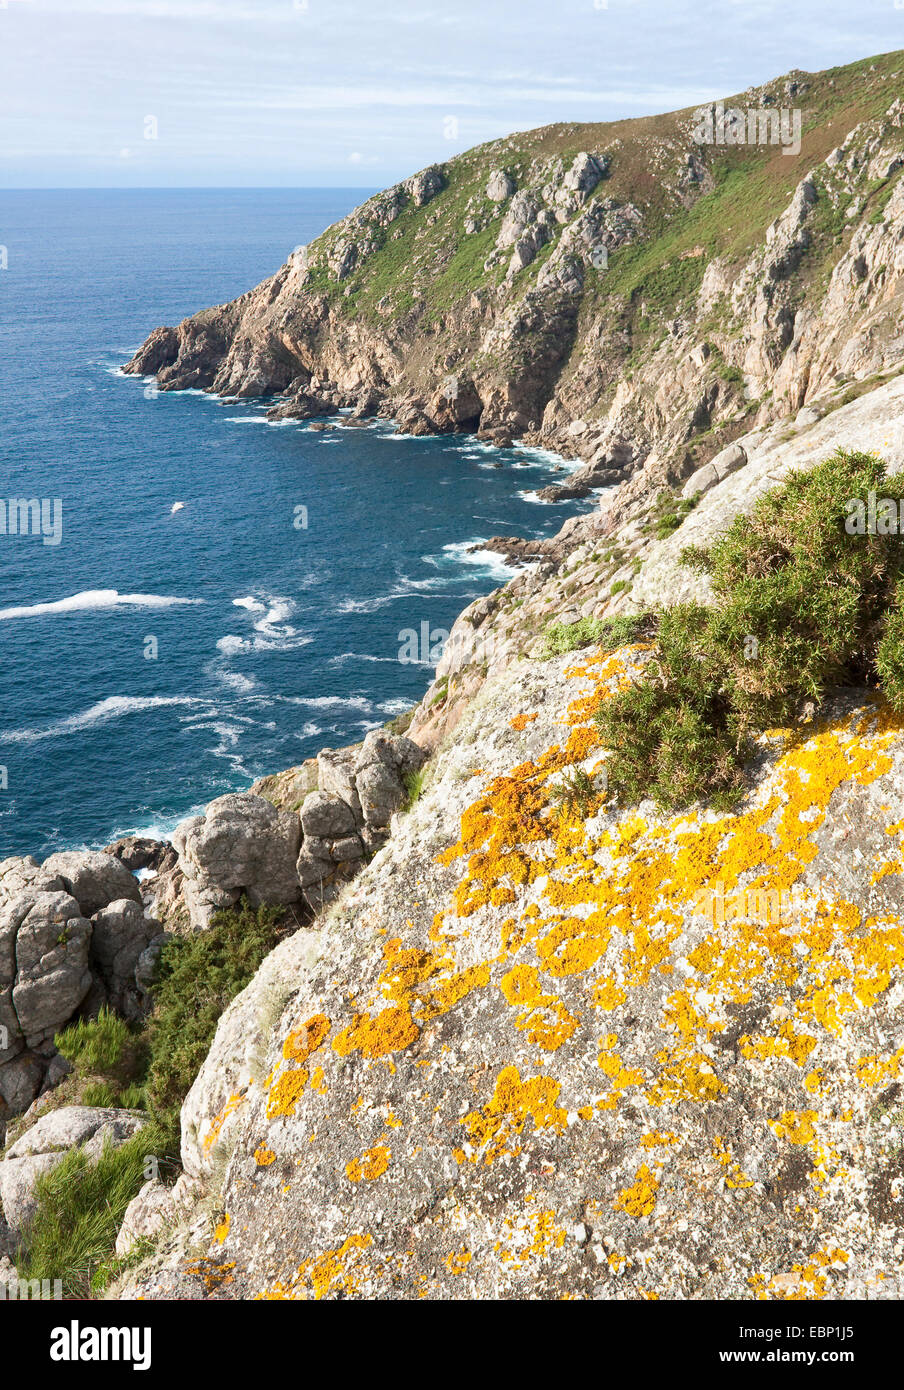 craggy rock bay at Kap Finisterre, Spain, Galicia, A Coruna, Kap Finisterre - Stock Image